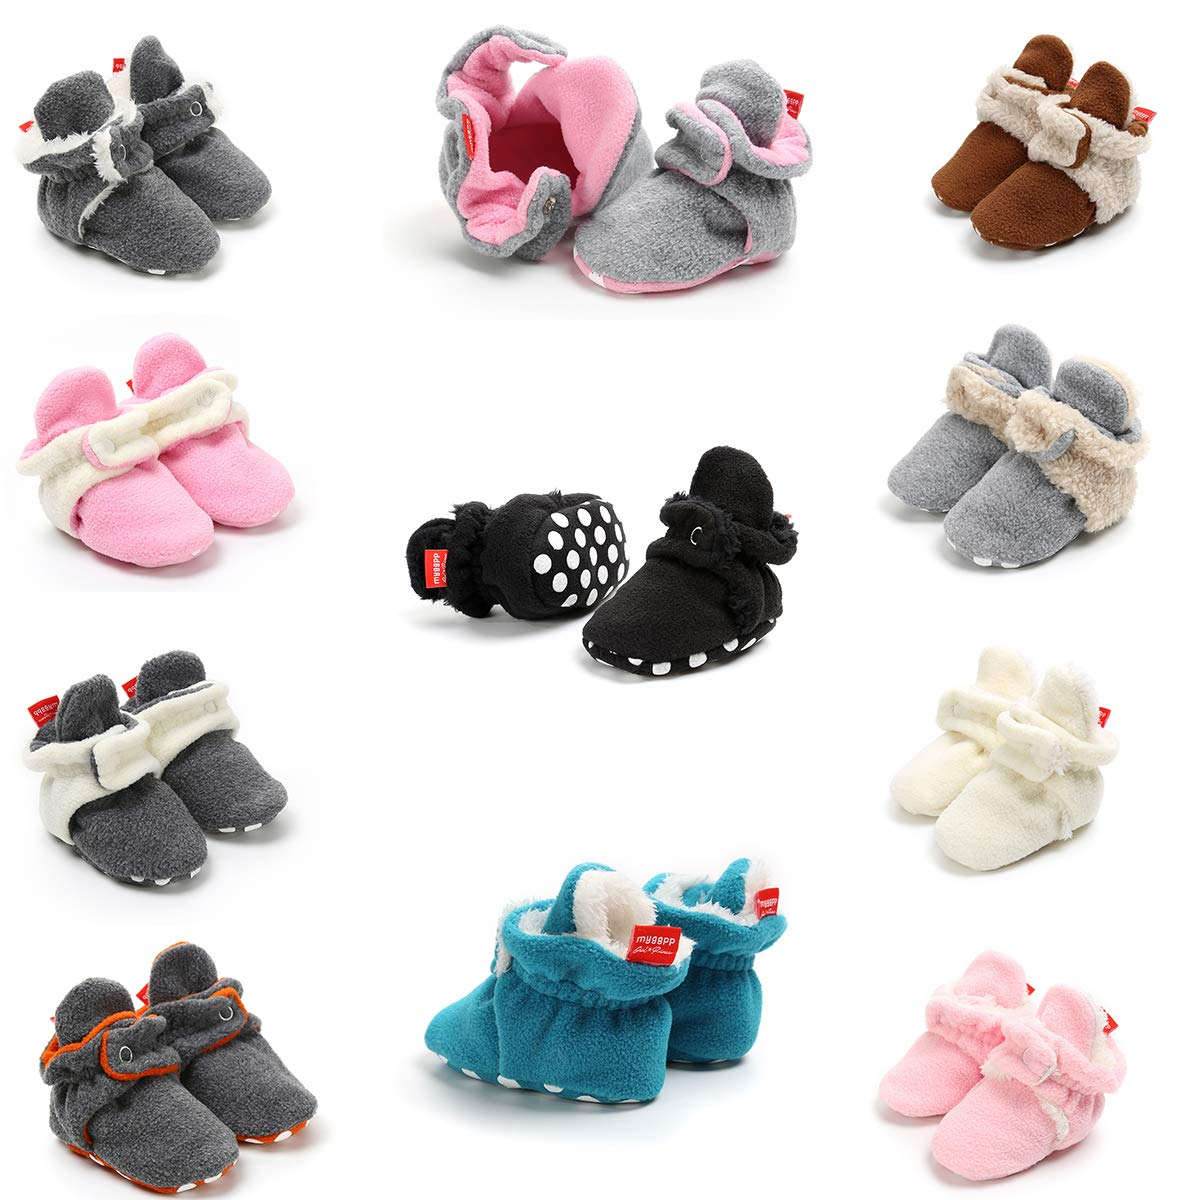 LUWU Baby Boy Girls Newborn Soft Fleece Booties Infant Toddle Crib Shoes Winter Snow Boots